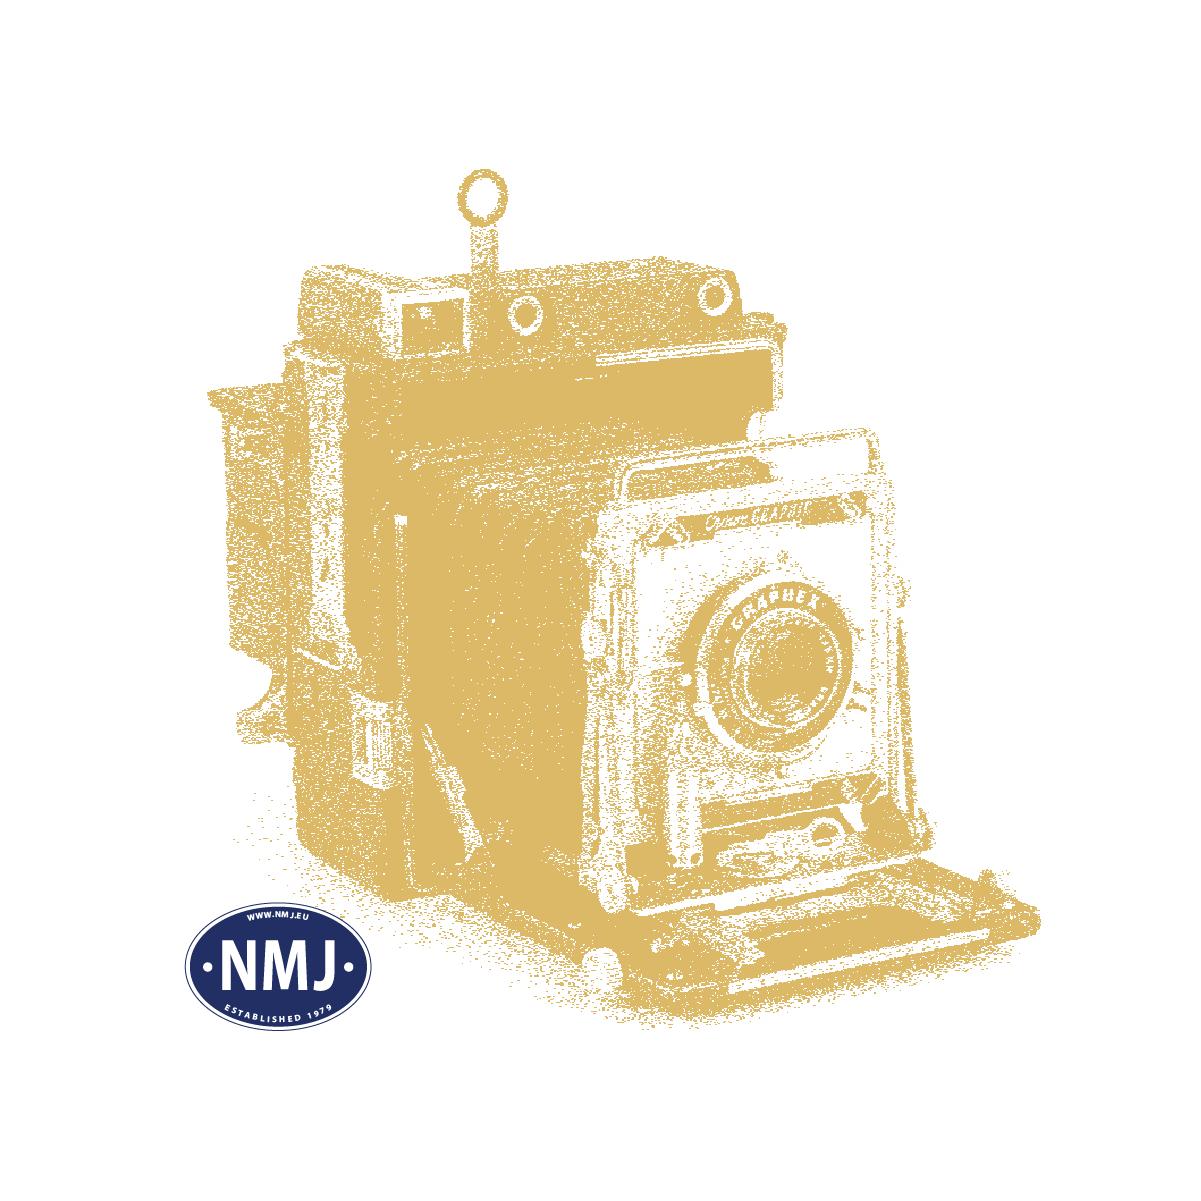 NMJSAO.3 - NMJ Superline Modell des Ao Schlafwagen in Messingausführung der NSB